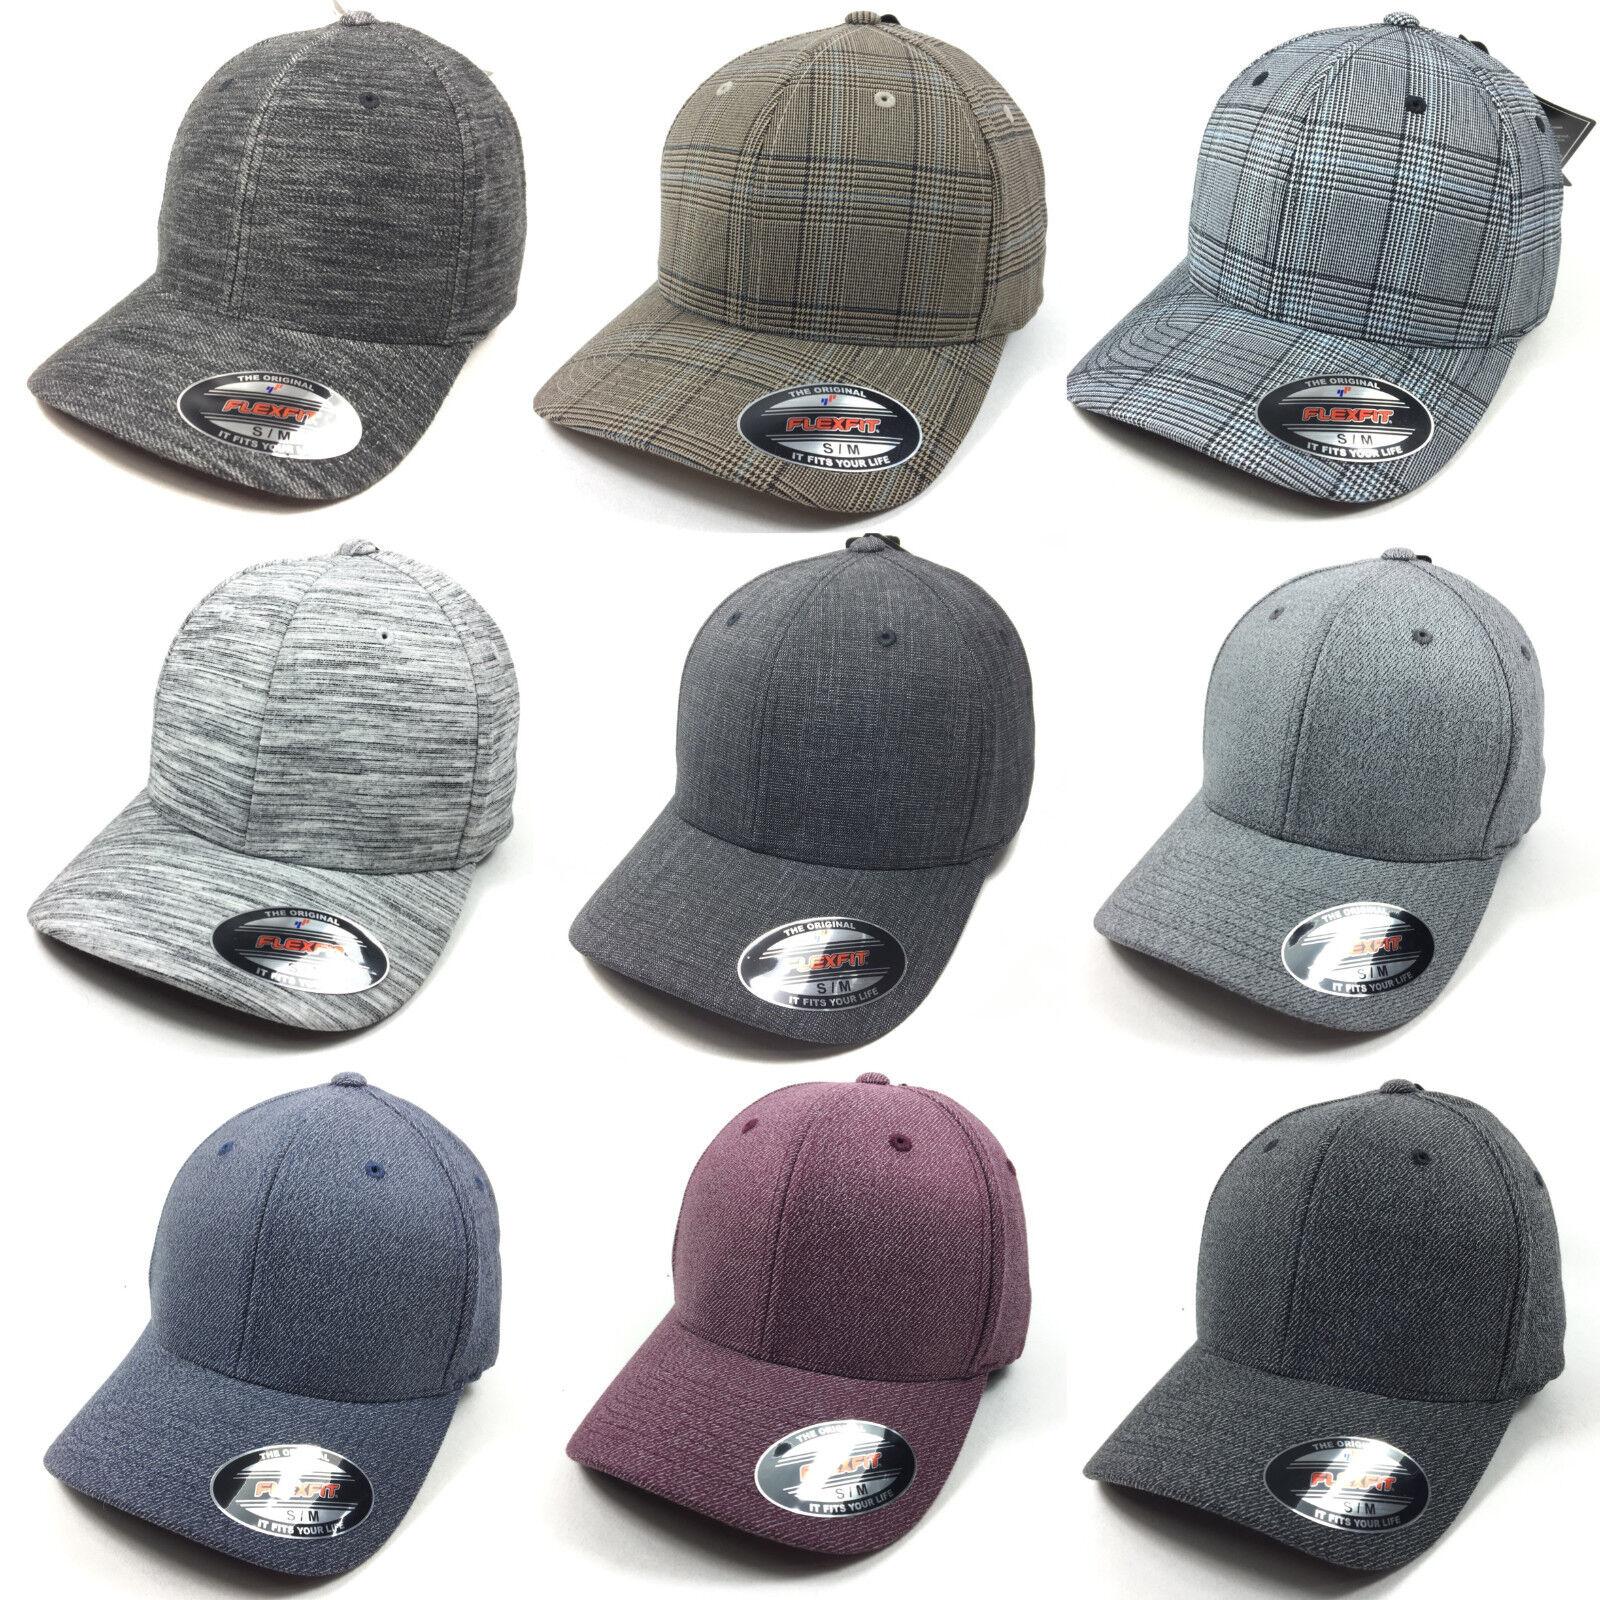 FLEXFIT  Baseball Cap  CAP BASECAP Baseball Caps Kappe melange NEU ORIGINAL